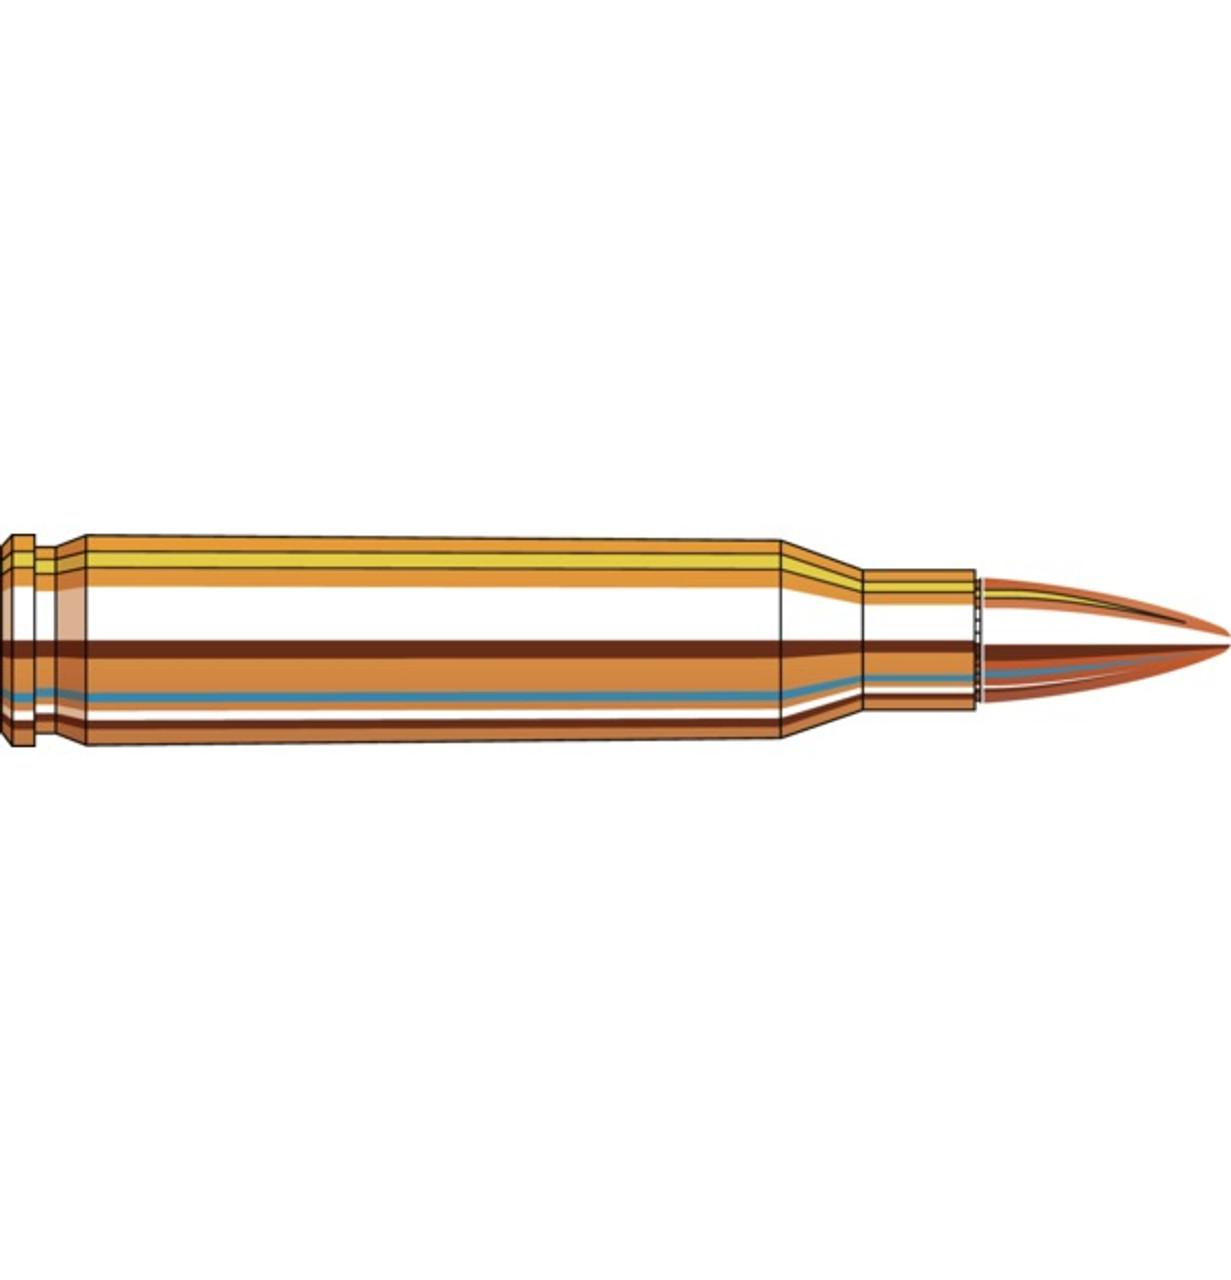 Hornady Frontier 5.56 NATO 55gr FMJ 500 rounds - M193 ammunition